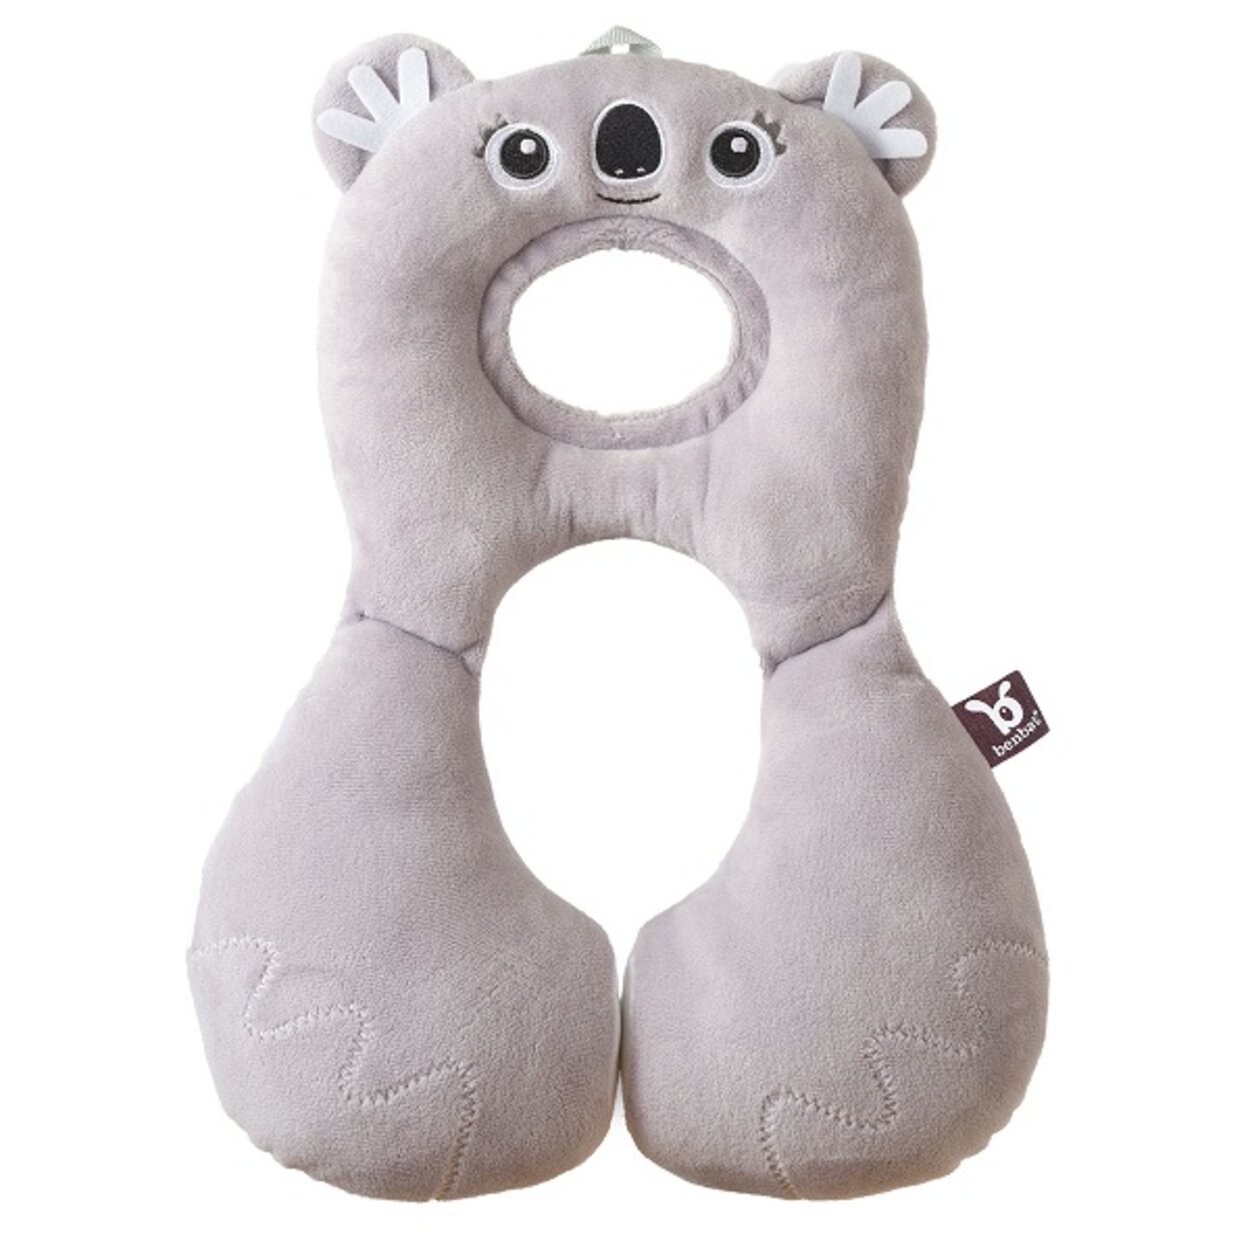 356003b6541 Nákrčník s opierkou hlavy 4-8 rokov koala 2017